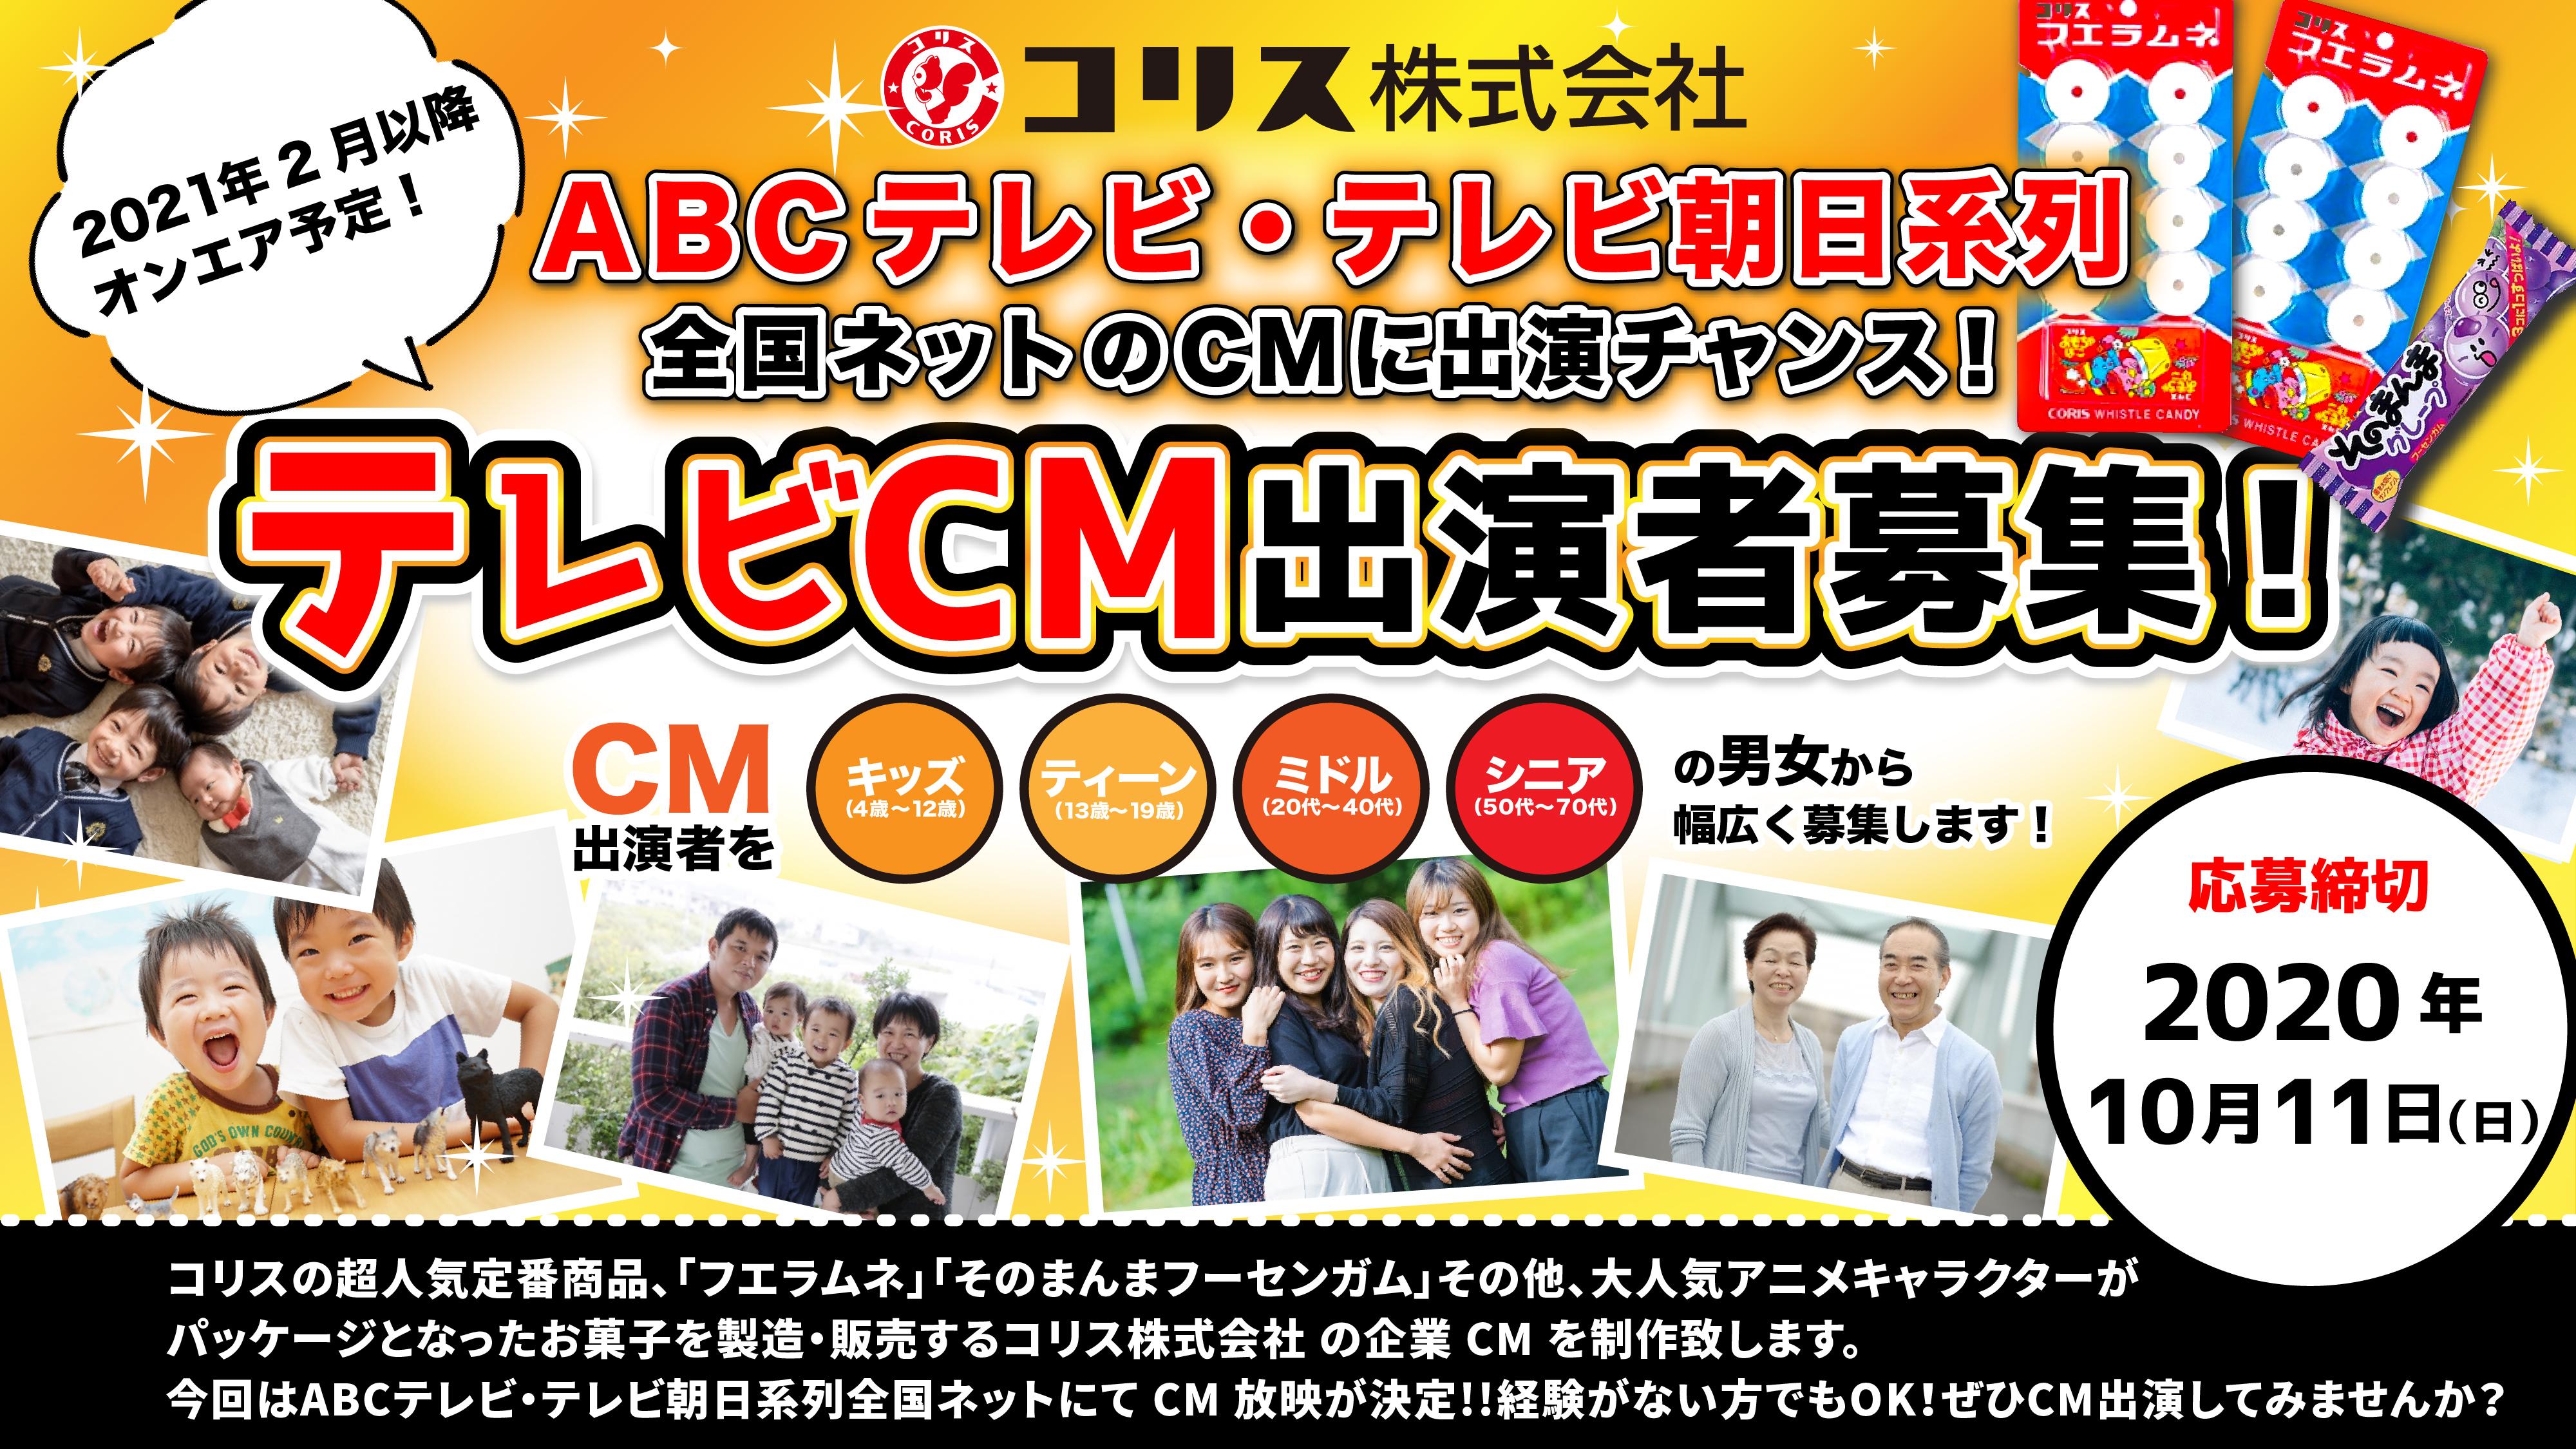 ABCテレビ・テレビ朝日系列全国ネットにてCM放映決定! 「コリス株式会社」企業CM出演者募集!